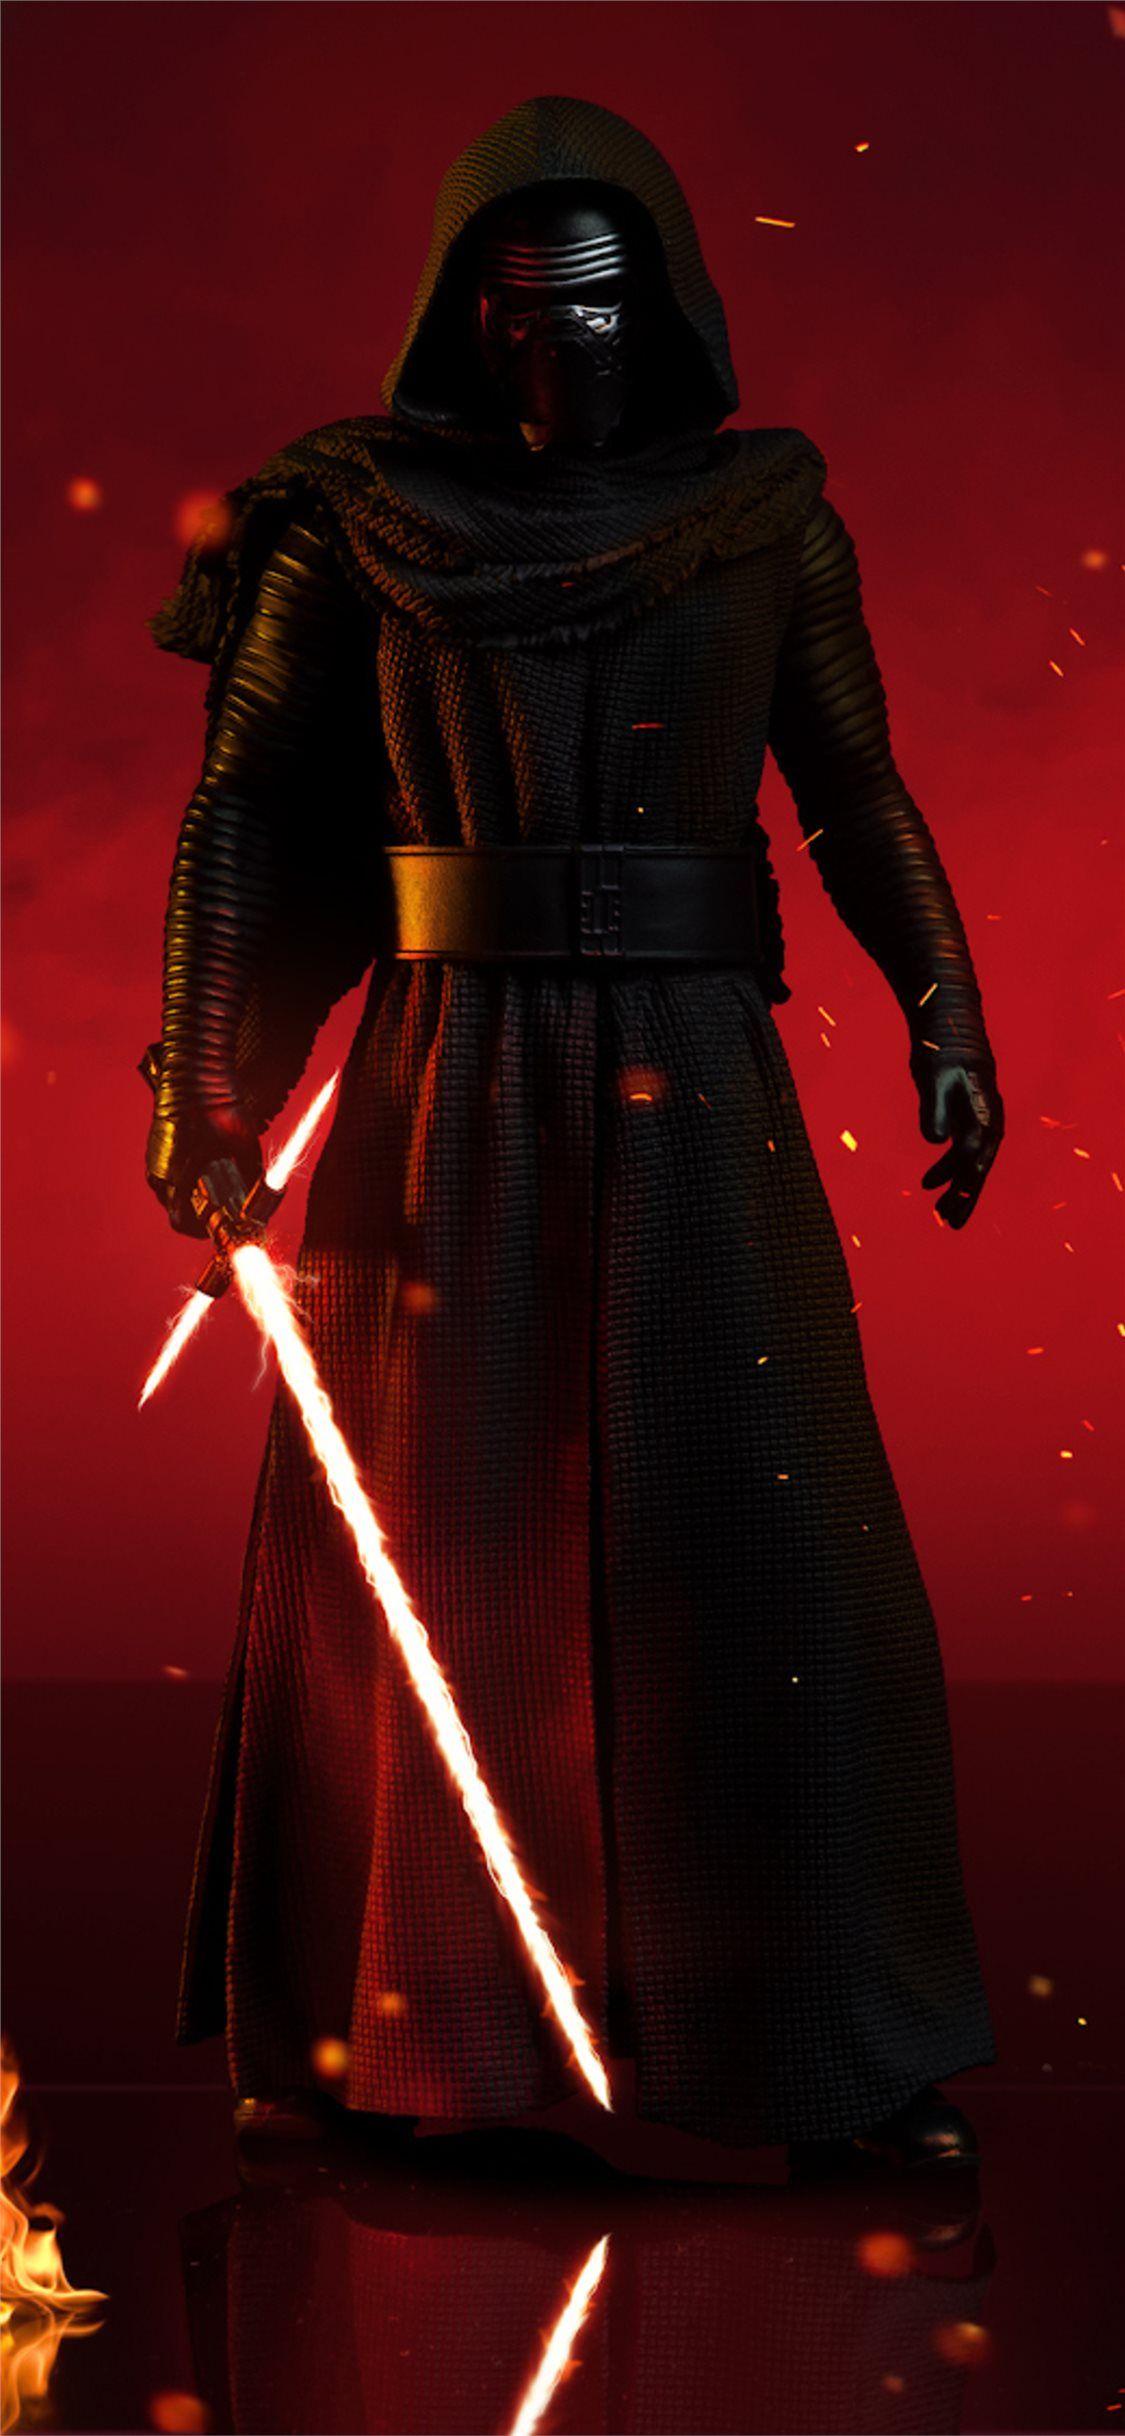 Cgi Kylo Ren Star Wars Wallpaper Star Wars Pictures Star Wars Images